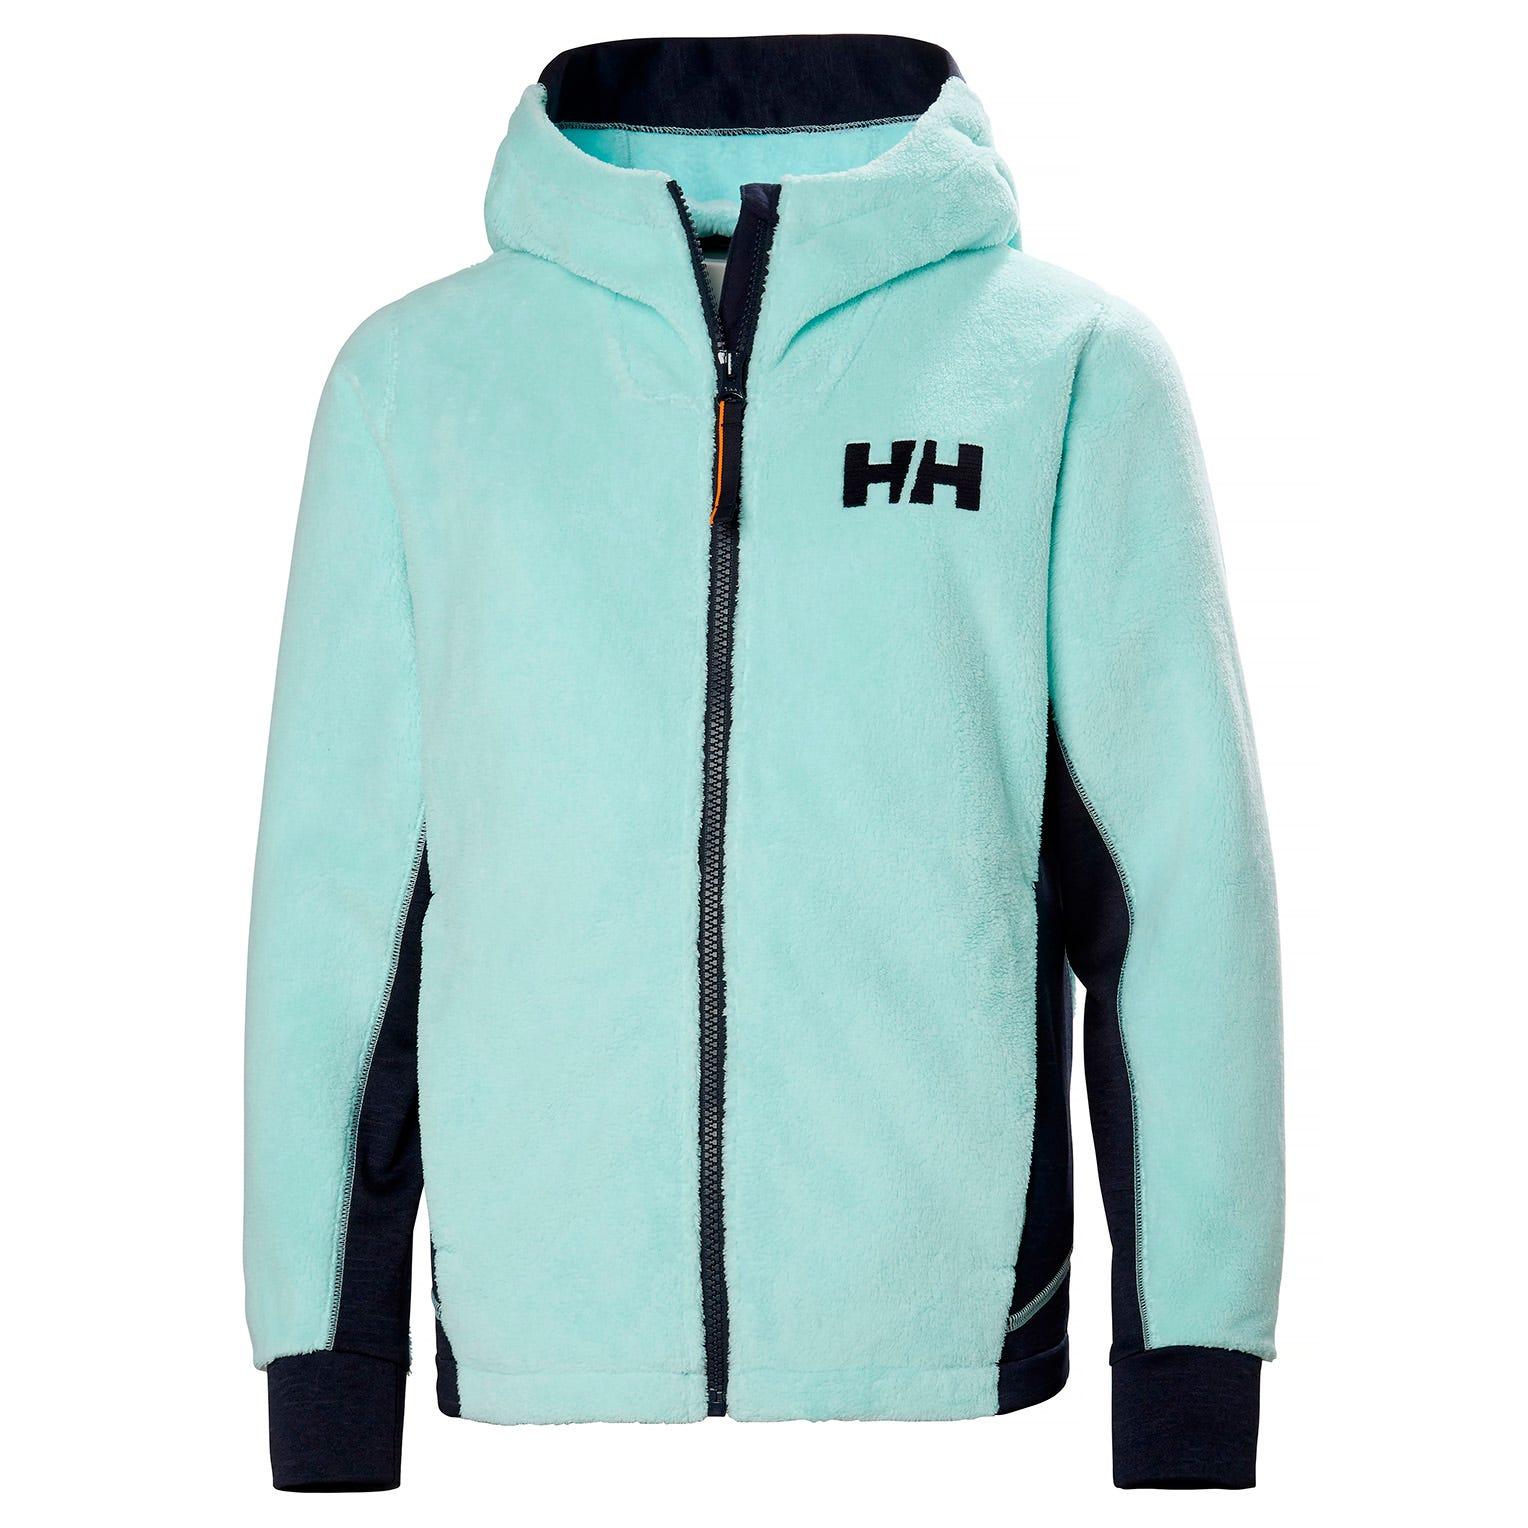 Helly Hansen Junior Chill Fz Hoodie Kids Fleece Blue 164/14